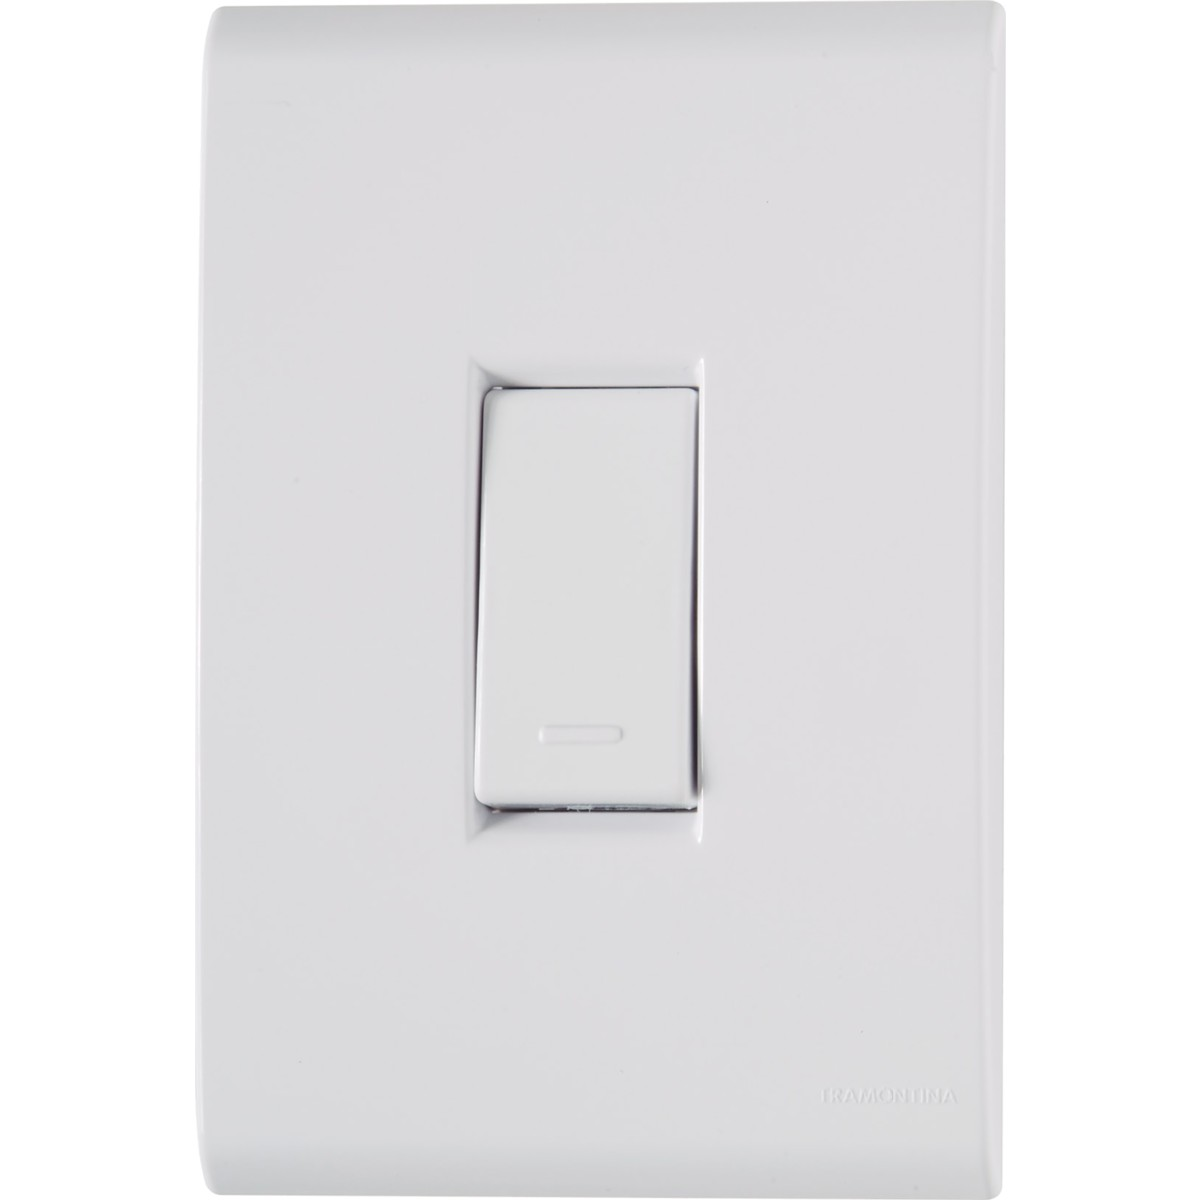 Conjunto Interruptor Simples 1 Modulo 10A - Liz - Tramontina